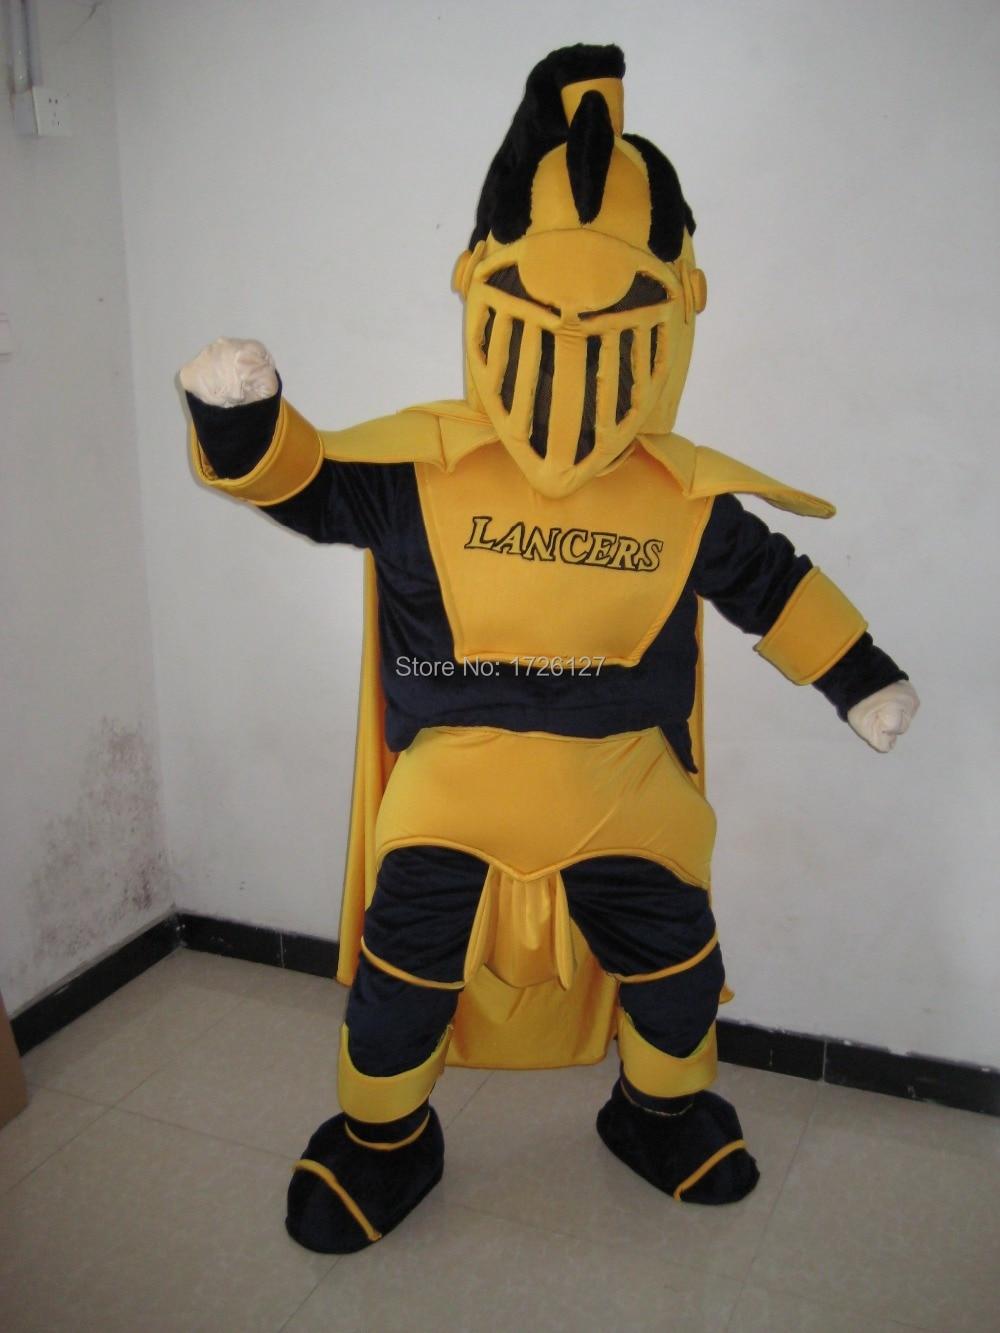 Lancers da mascote espartano cavaleiro mascot costume costume fantasia kits traje cosplay anime mascotte fantasia vestido traje do carnaval em Mascote de ... & Lancers da mascote espartano cavaleiro mascot costume costume ...